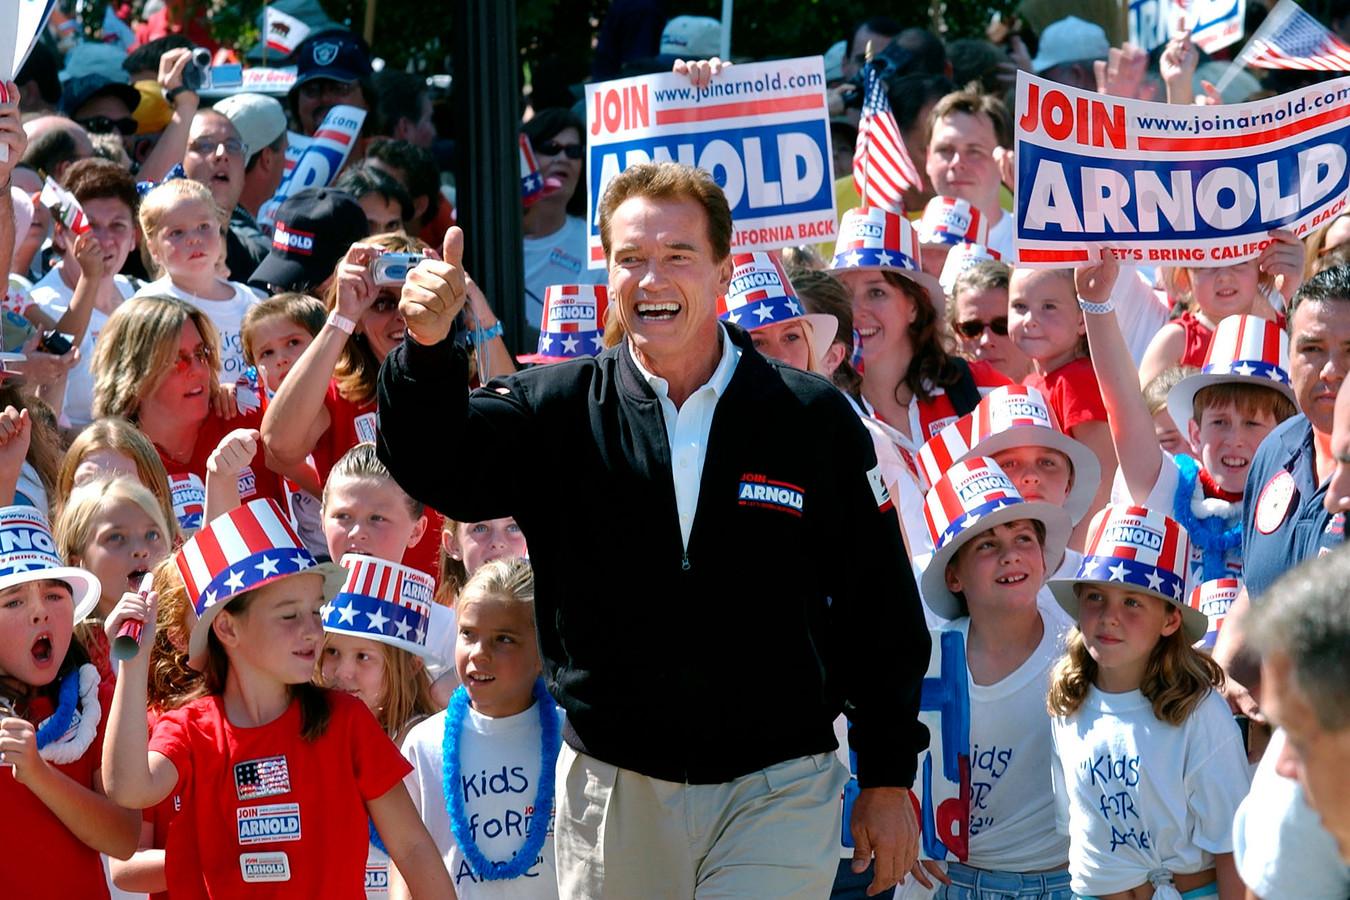 Arnold Schwarzenegger voert campagne in 2003.